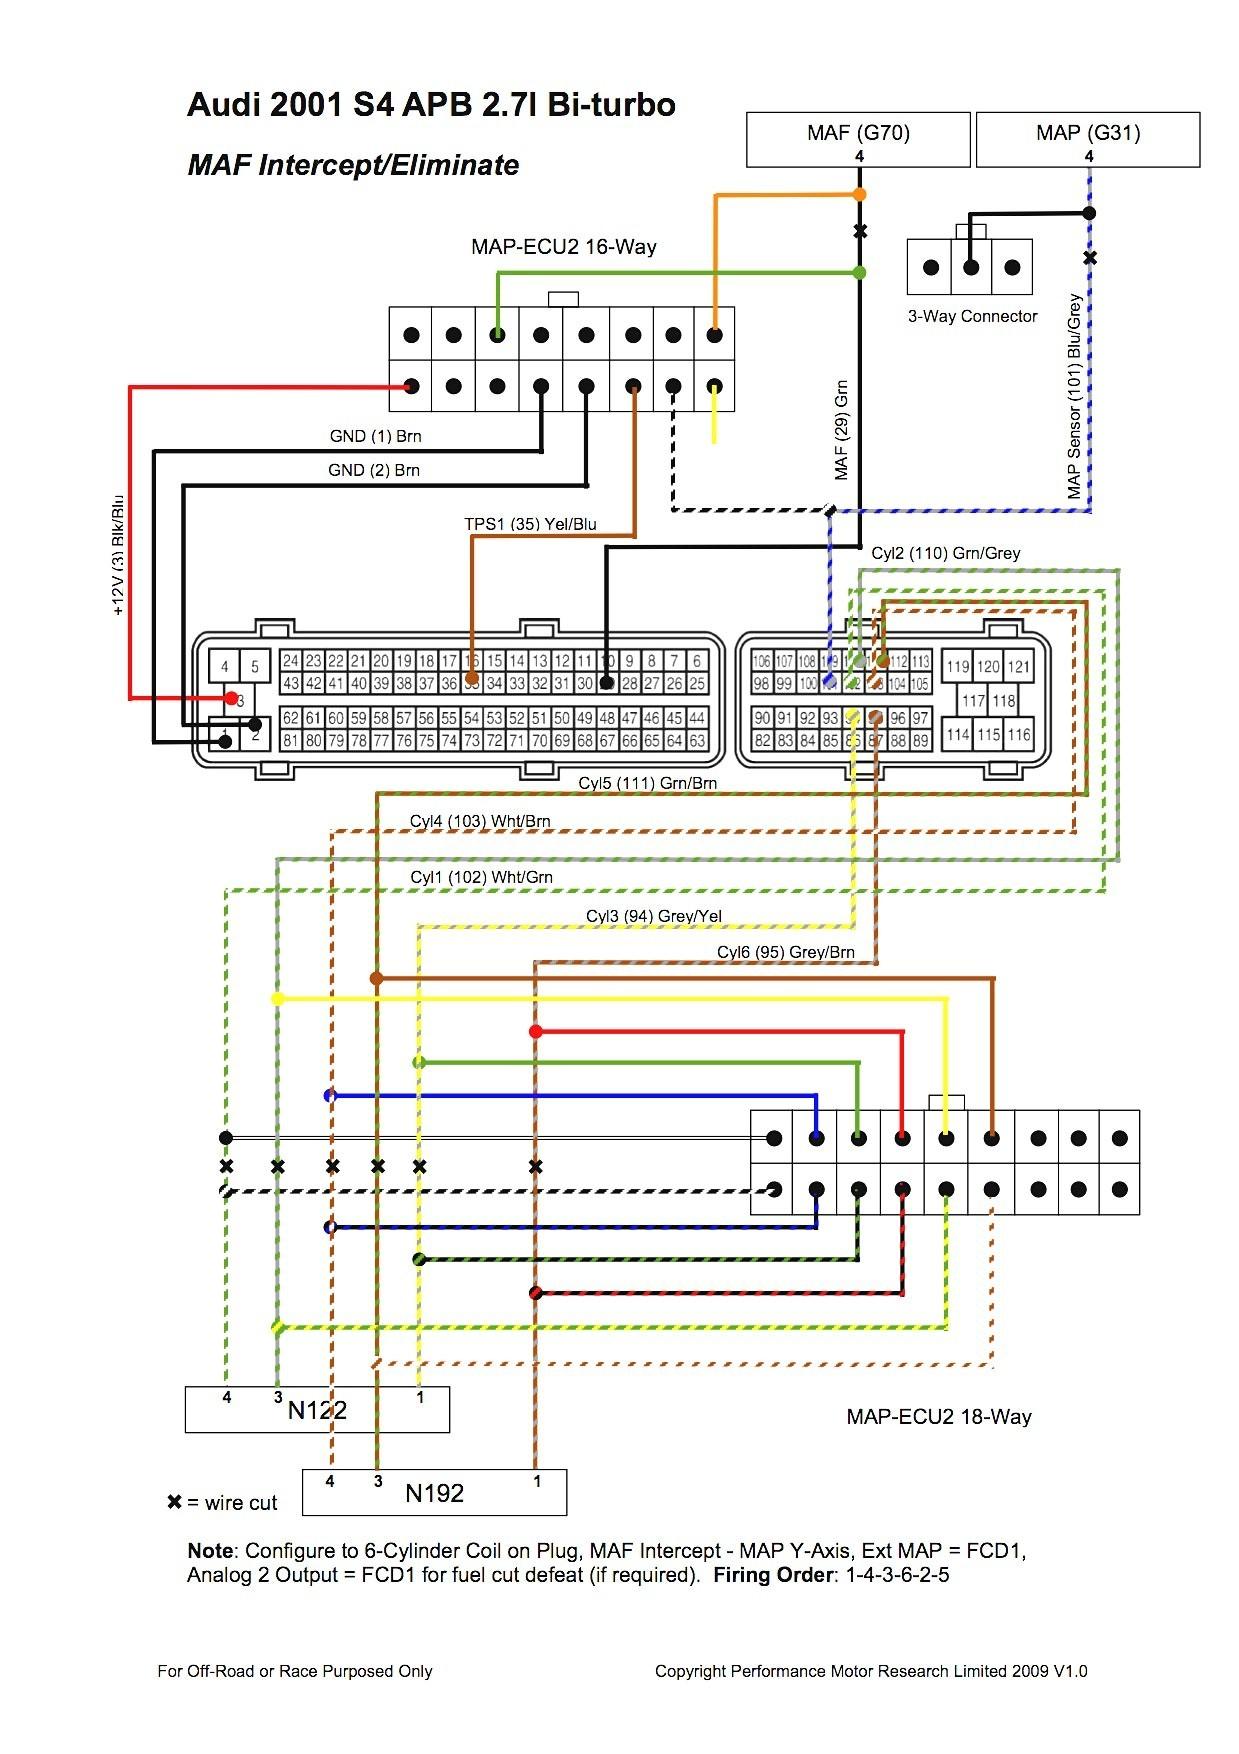 1995mitsubishi Eclipse Tranny Wiring Diagram 97 Jettum Wiring Diagram Printer Friendly Wiring Diagram Of 1995mitsubishi Eclipse Tranny Wiring Diagram